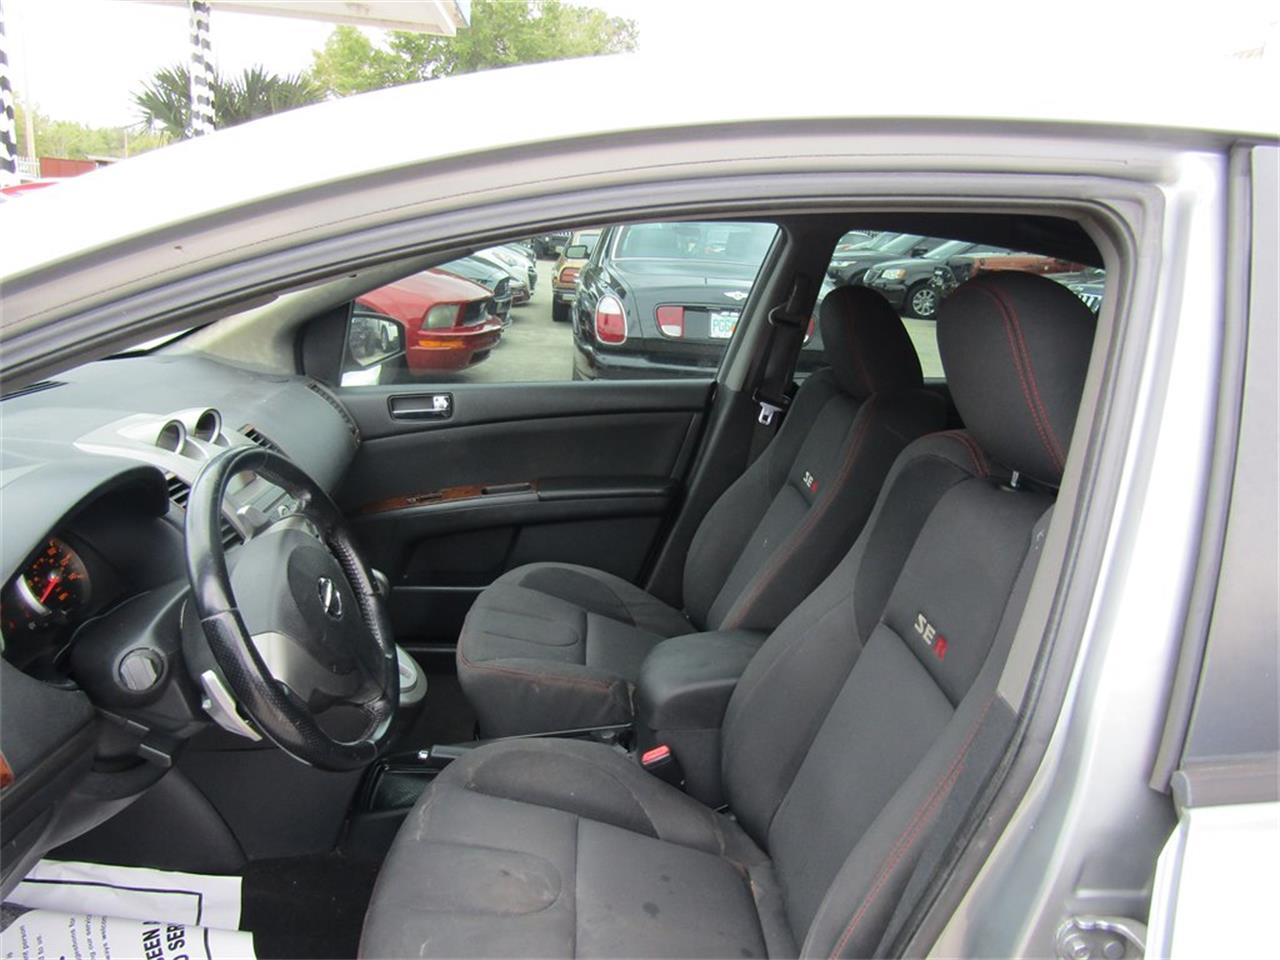 2007 Nissan Sentra (CC-1298036) for sale in Orlando, Florida